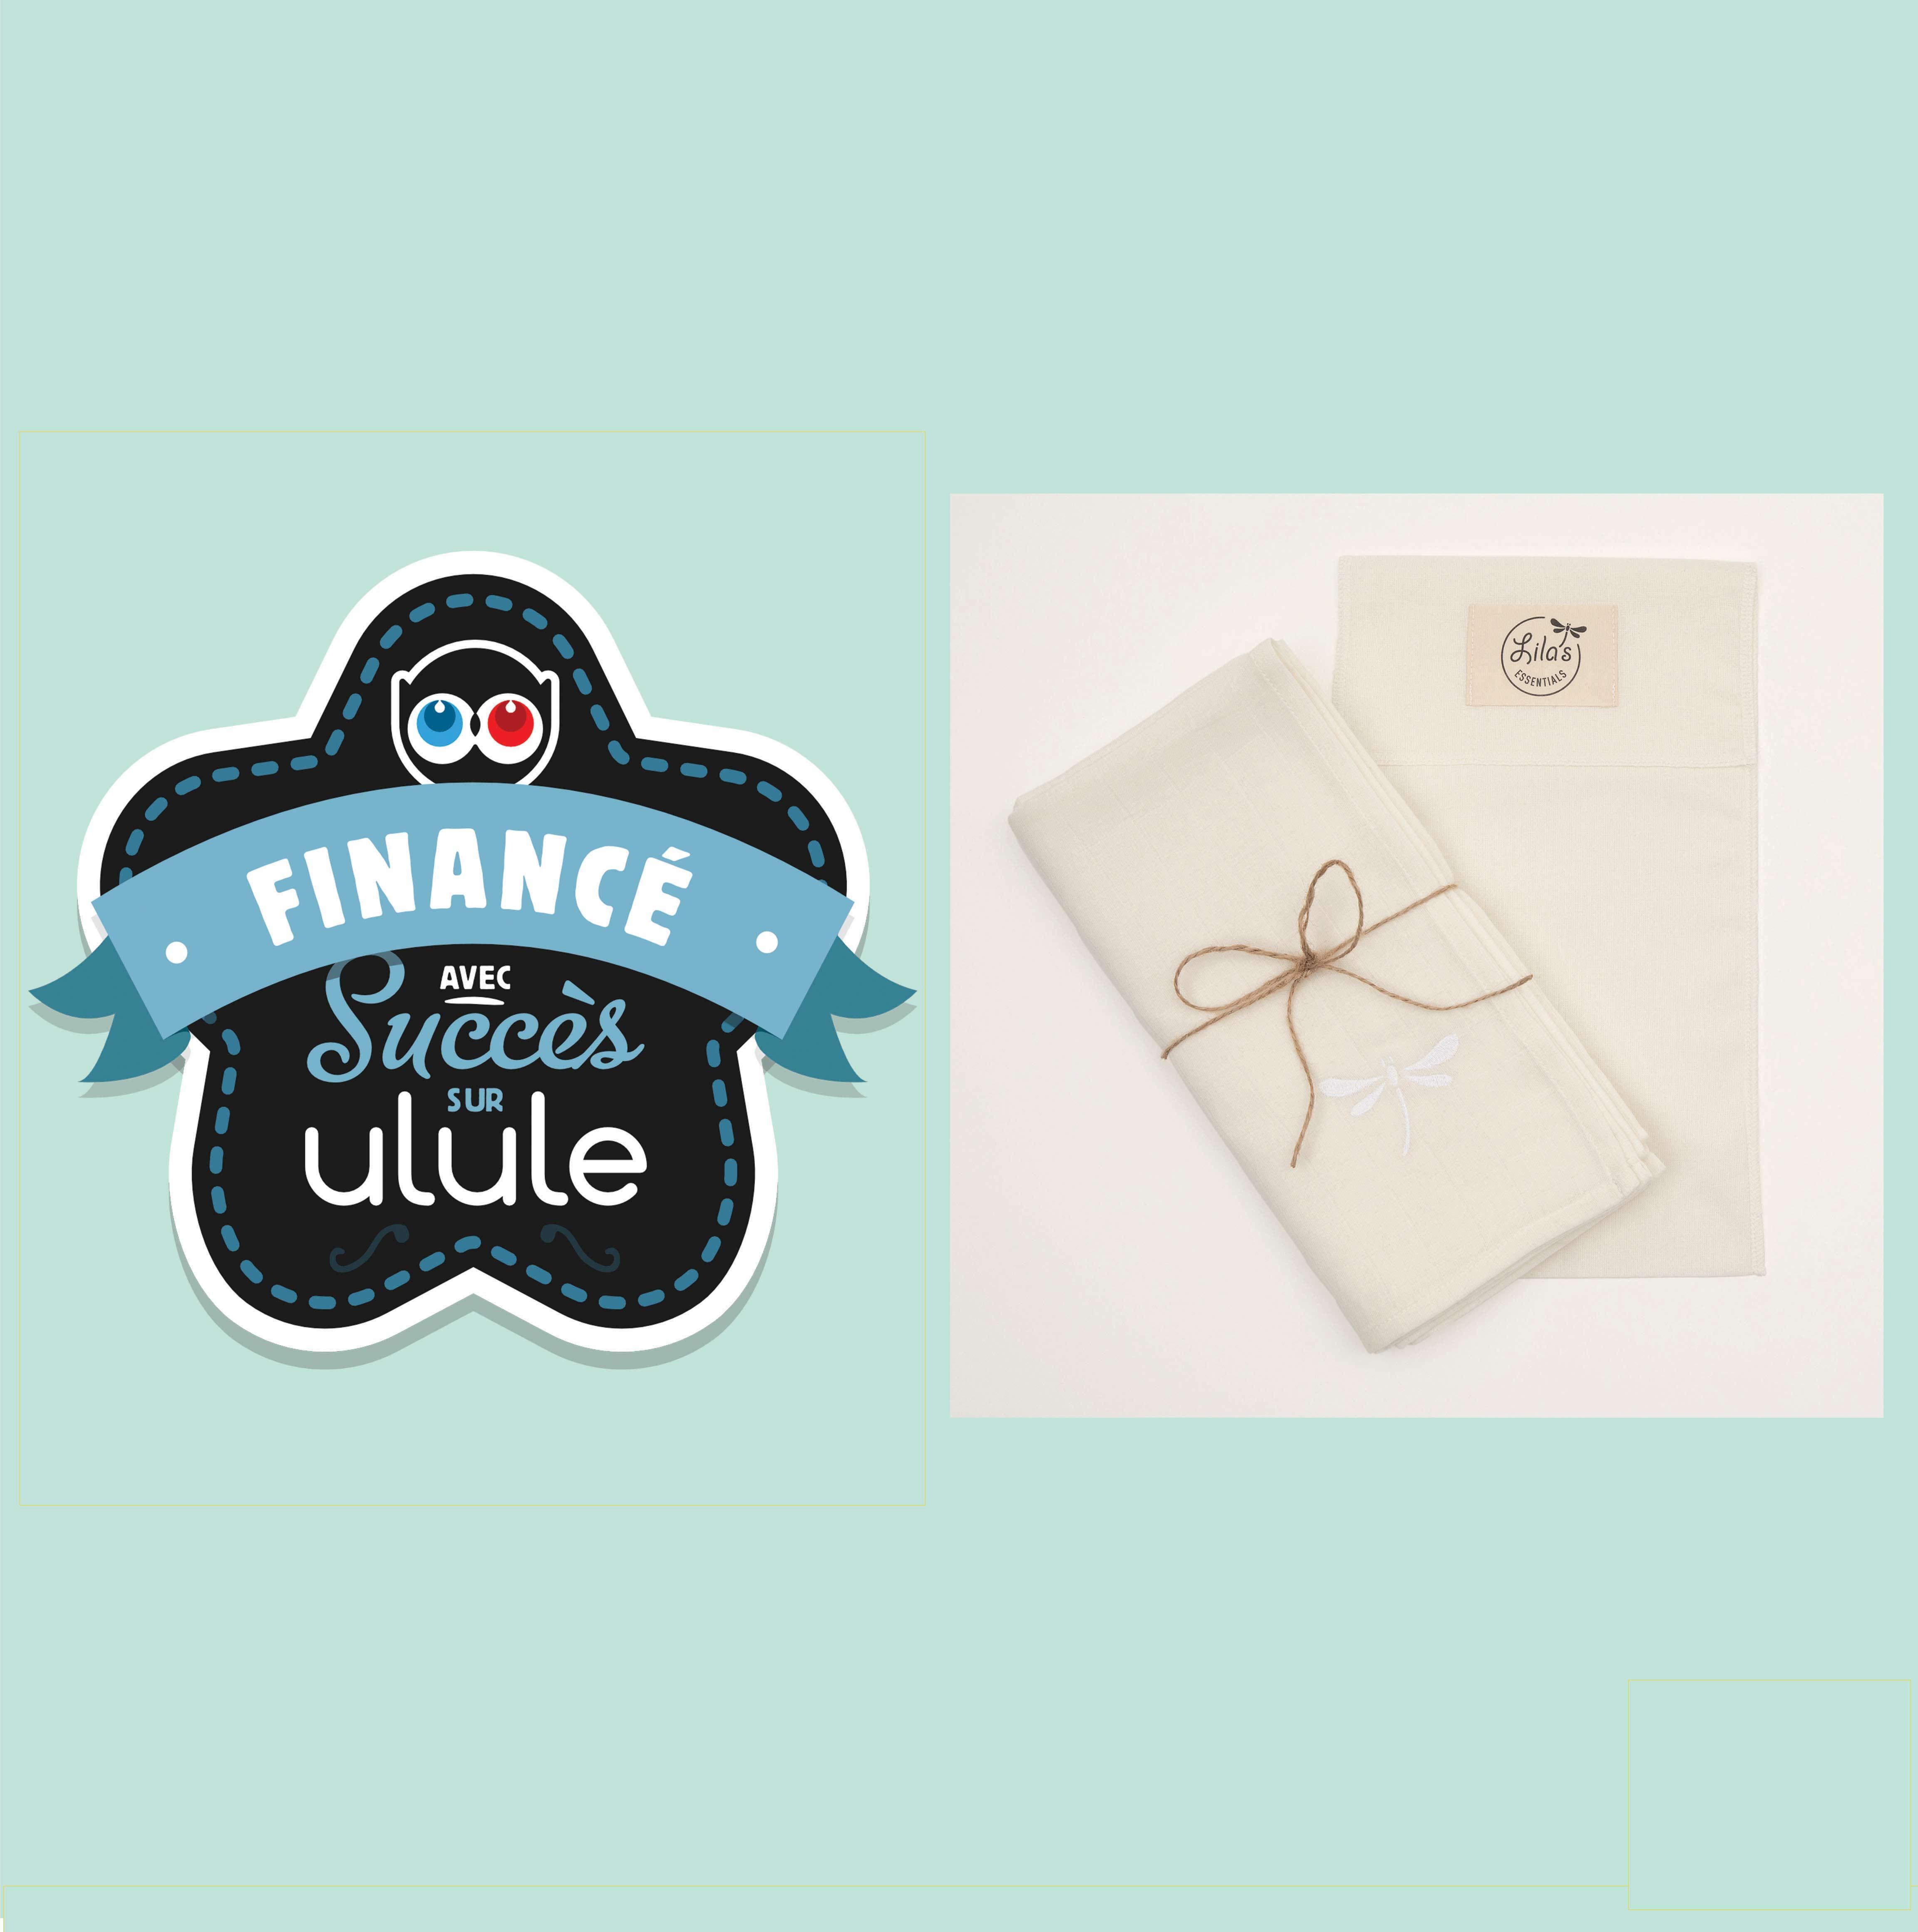 ulule campaign successfully financed